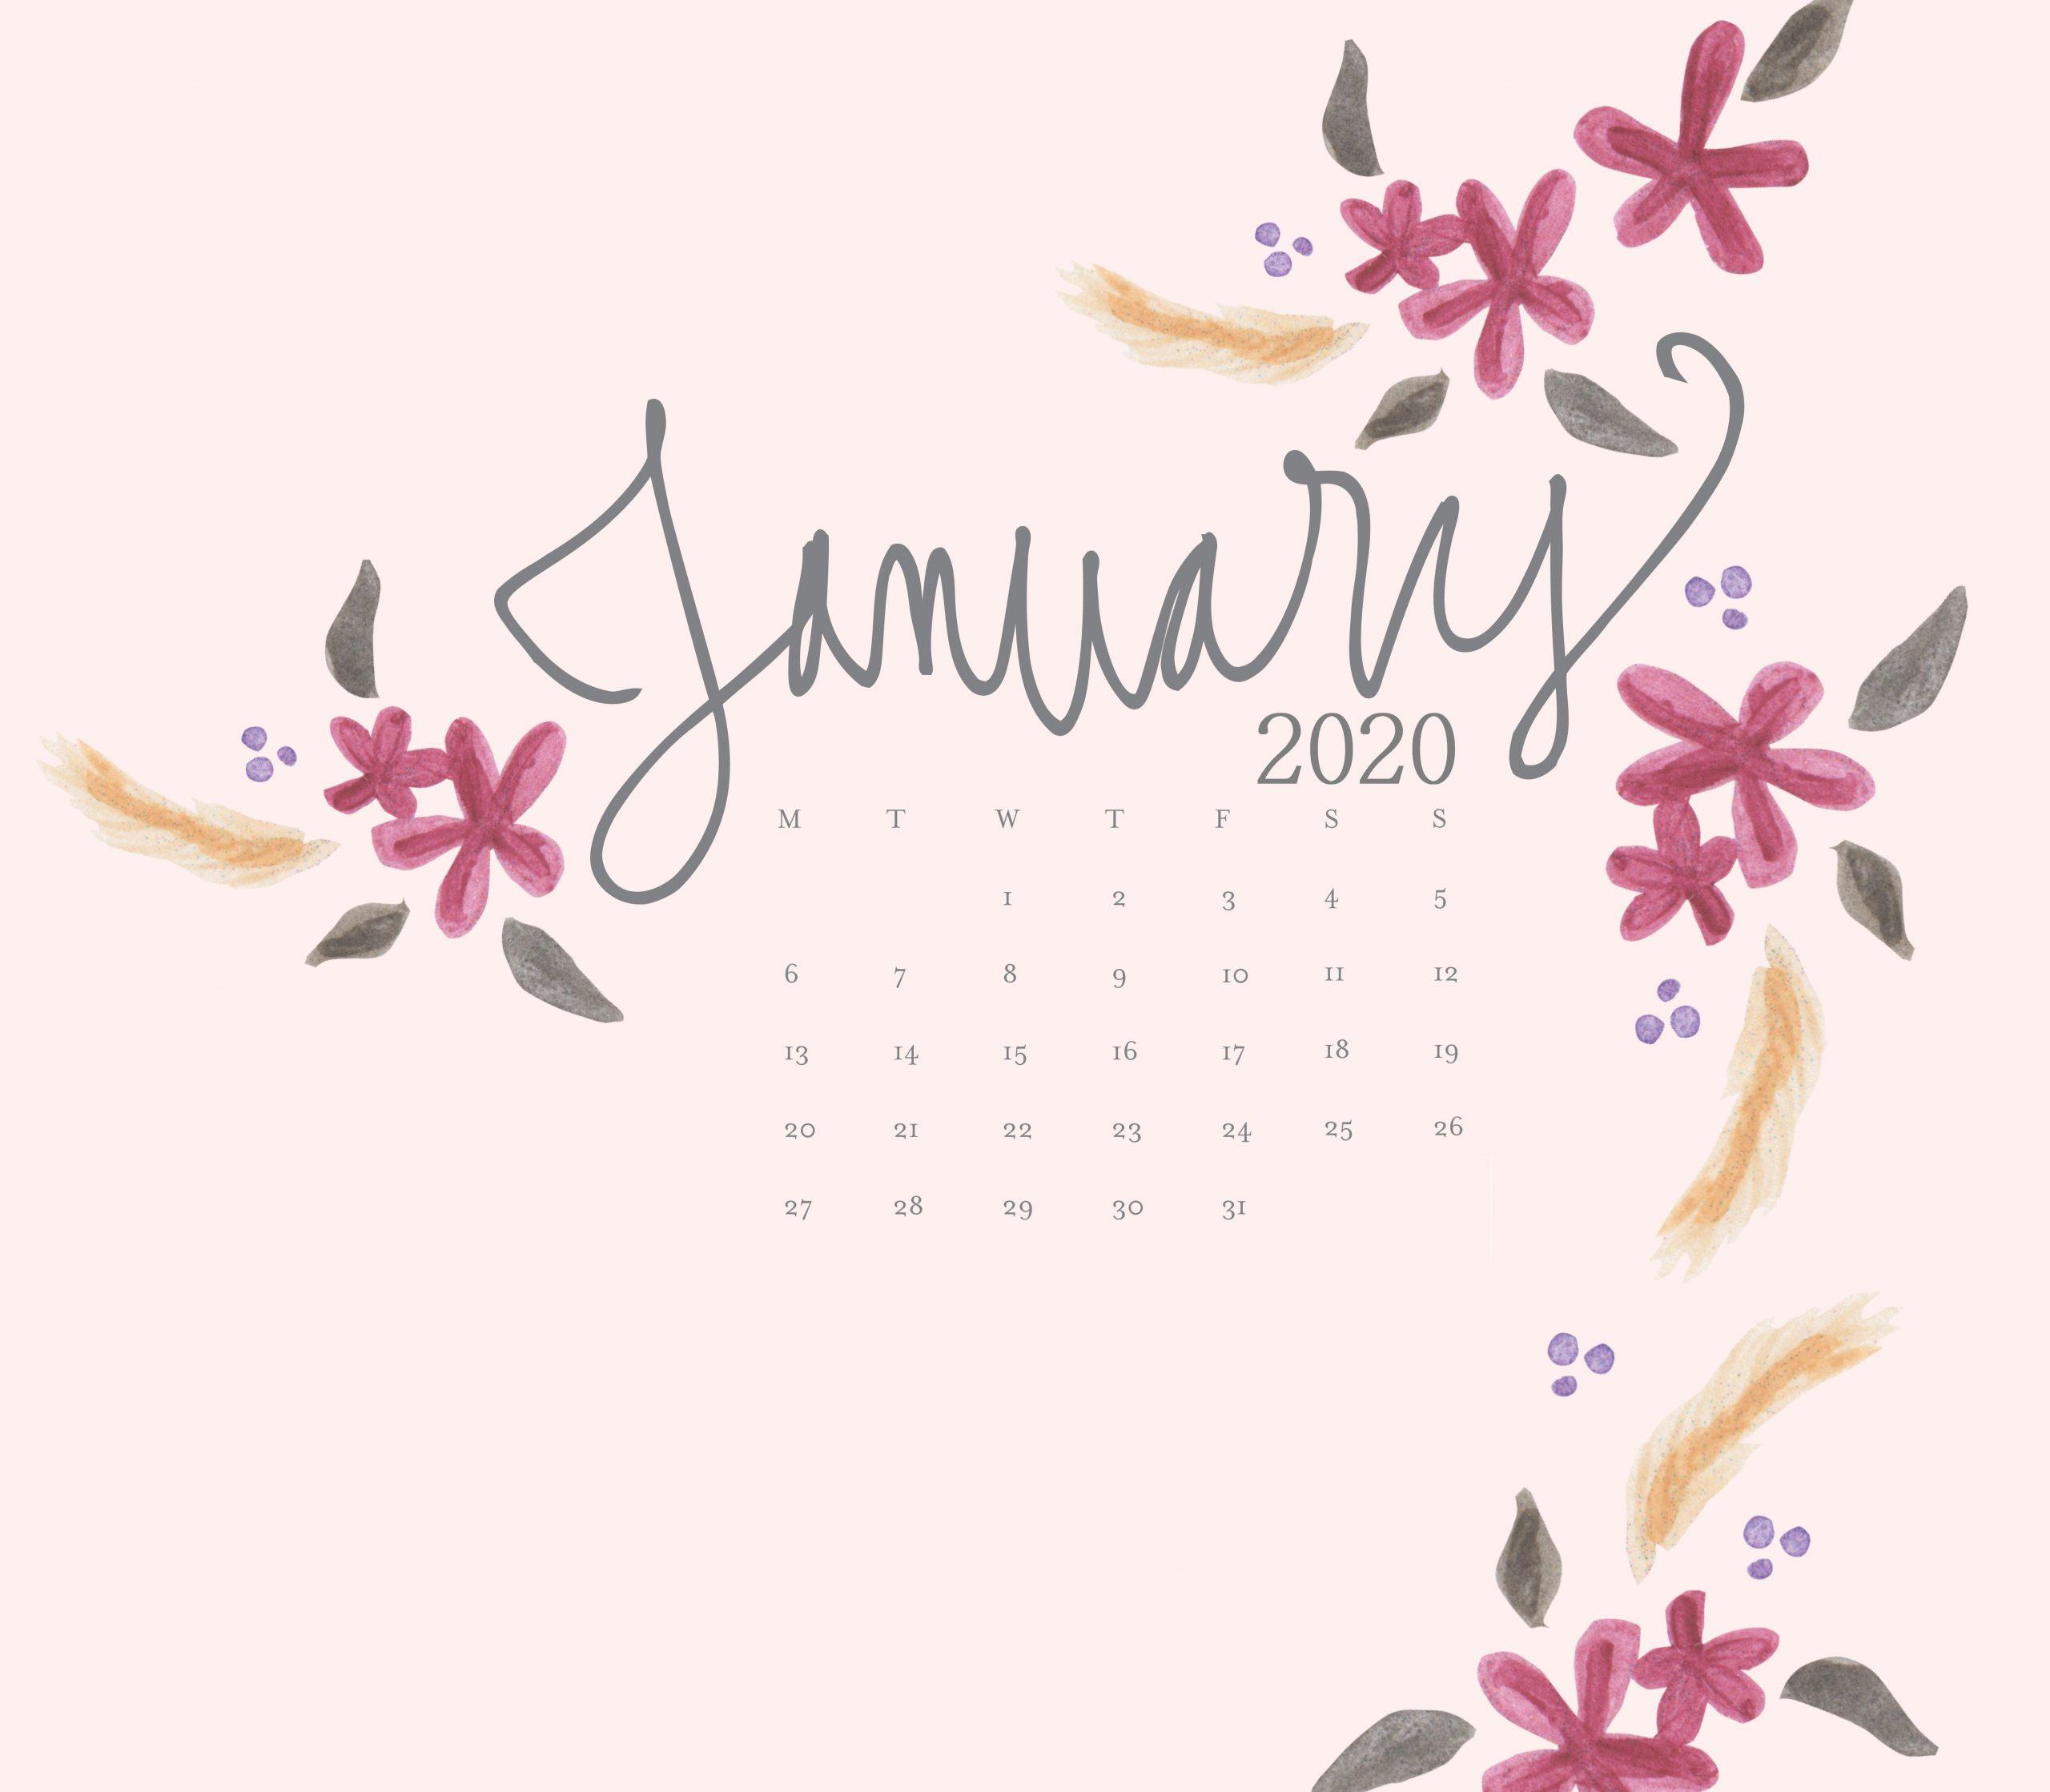 January 2020 Desktop Calendar Wallpaper Max Calendars 2560x2238